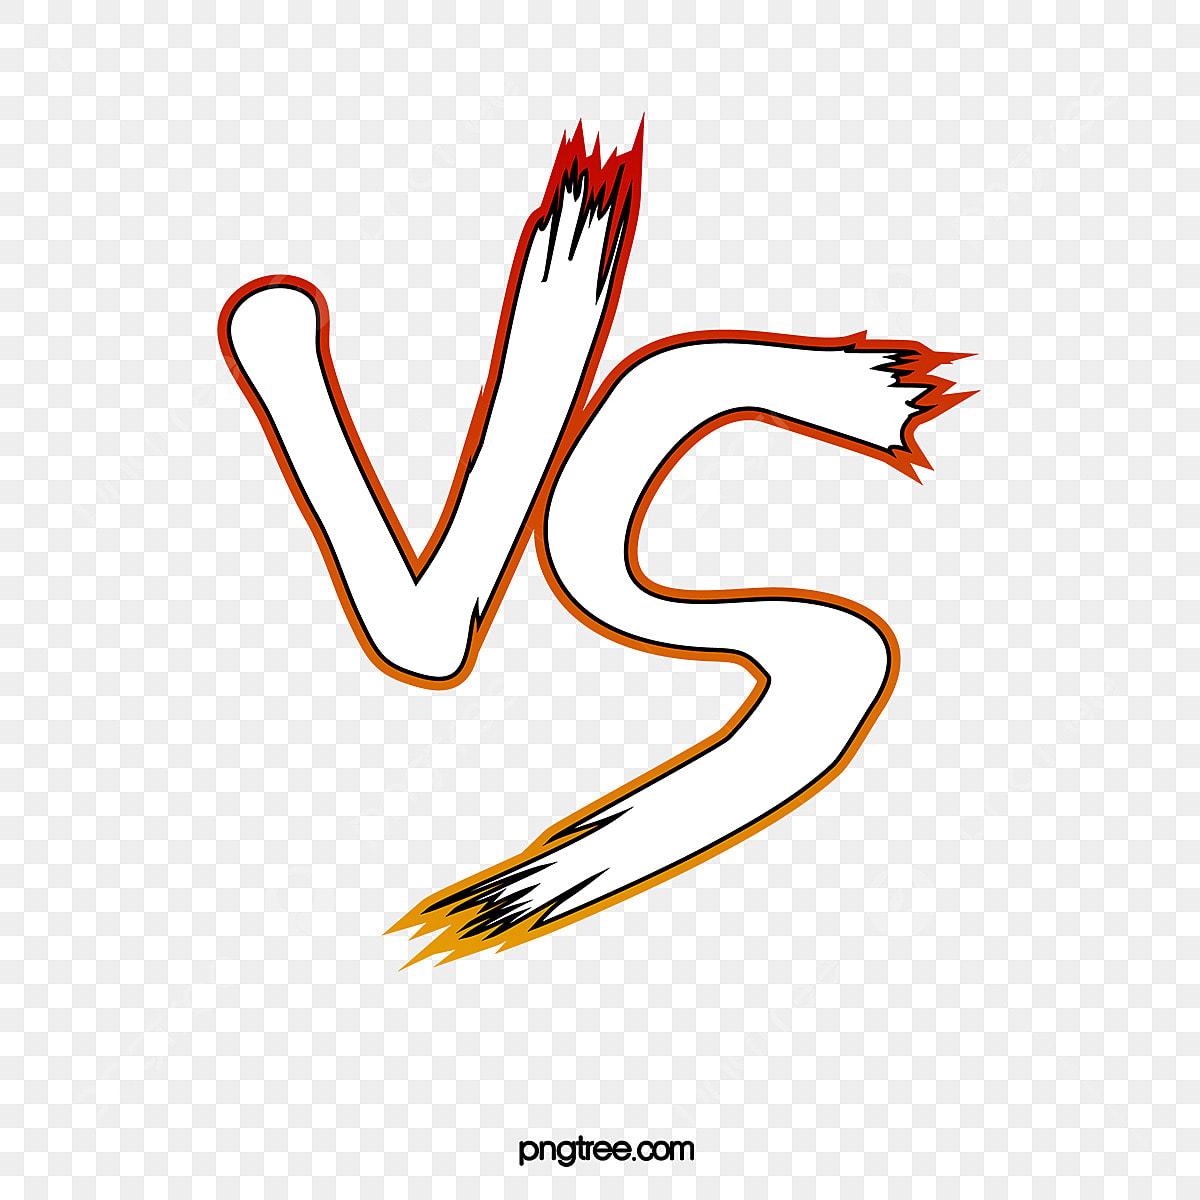 Vs対対決, Vs毛筆字, 対決PK, 試合vs画像素材の無料ダウンロードの ...